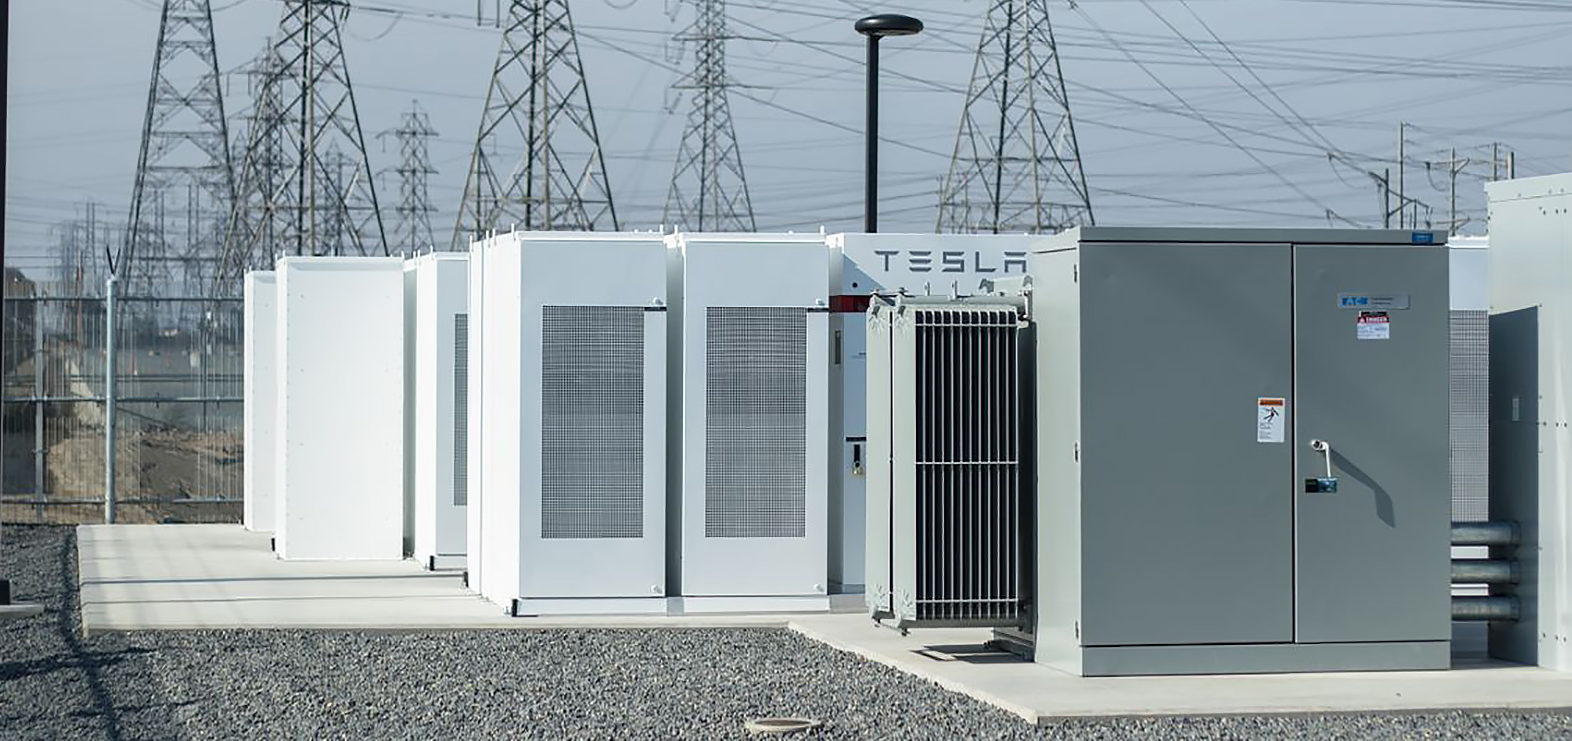 Tesla Model S Interior >> Tesla Powerwall, Powerpack batteries helps Nova Scotia weather power outages